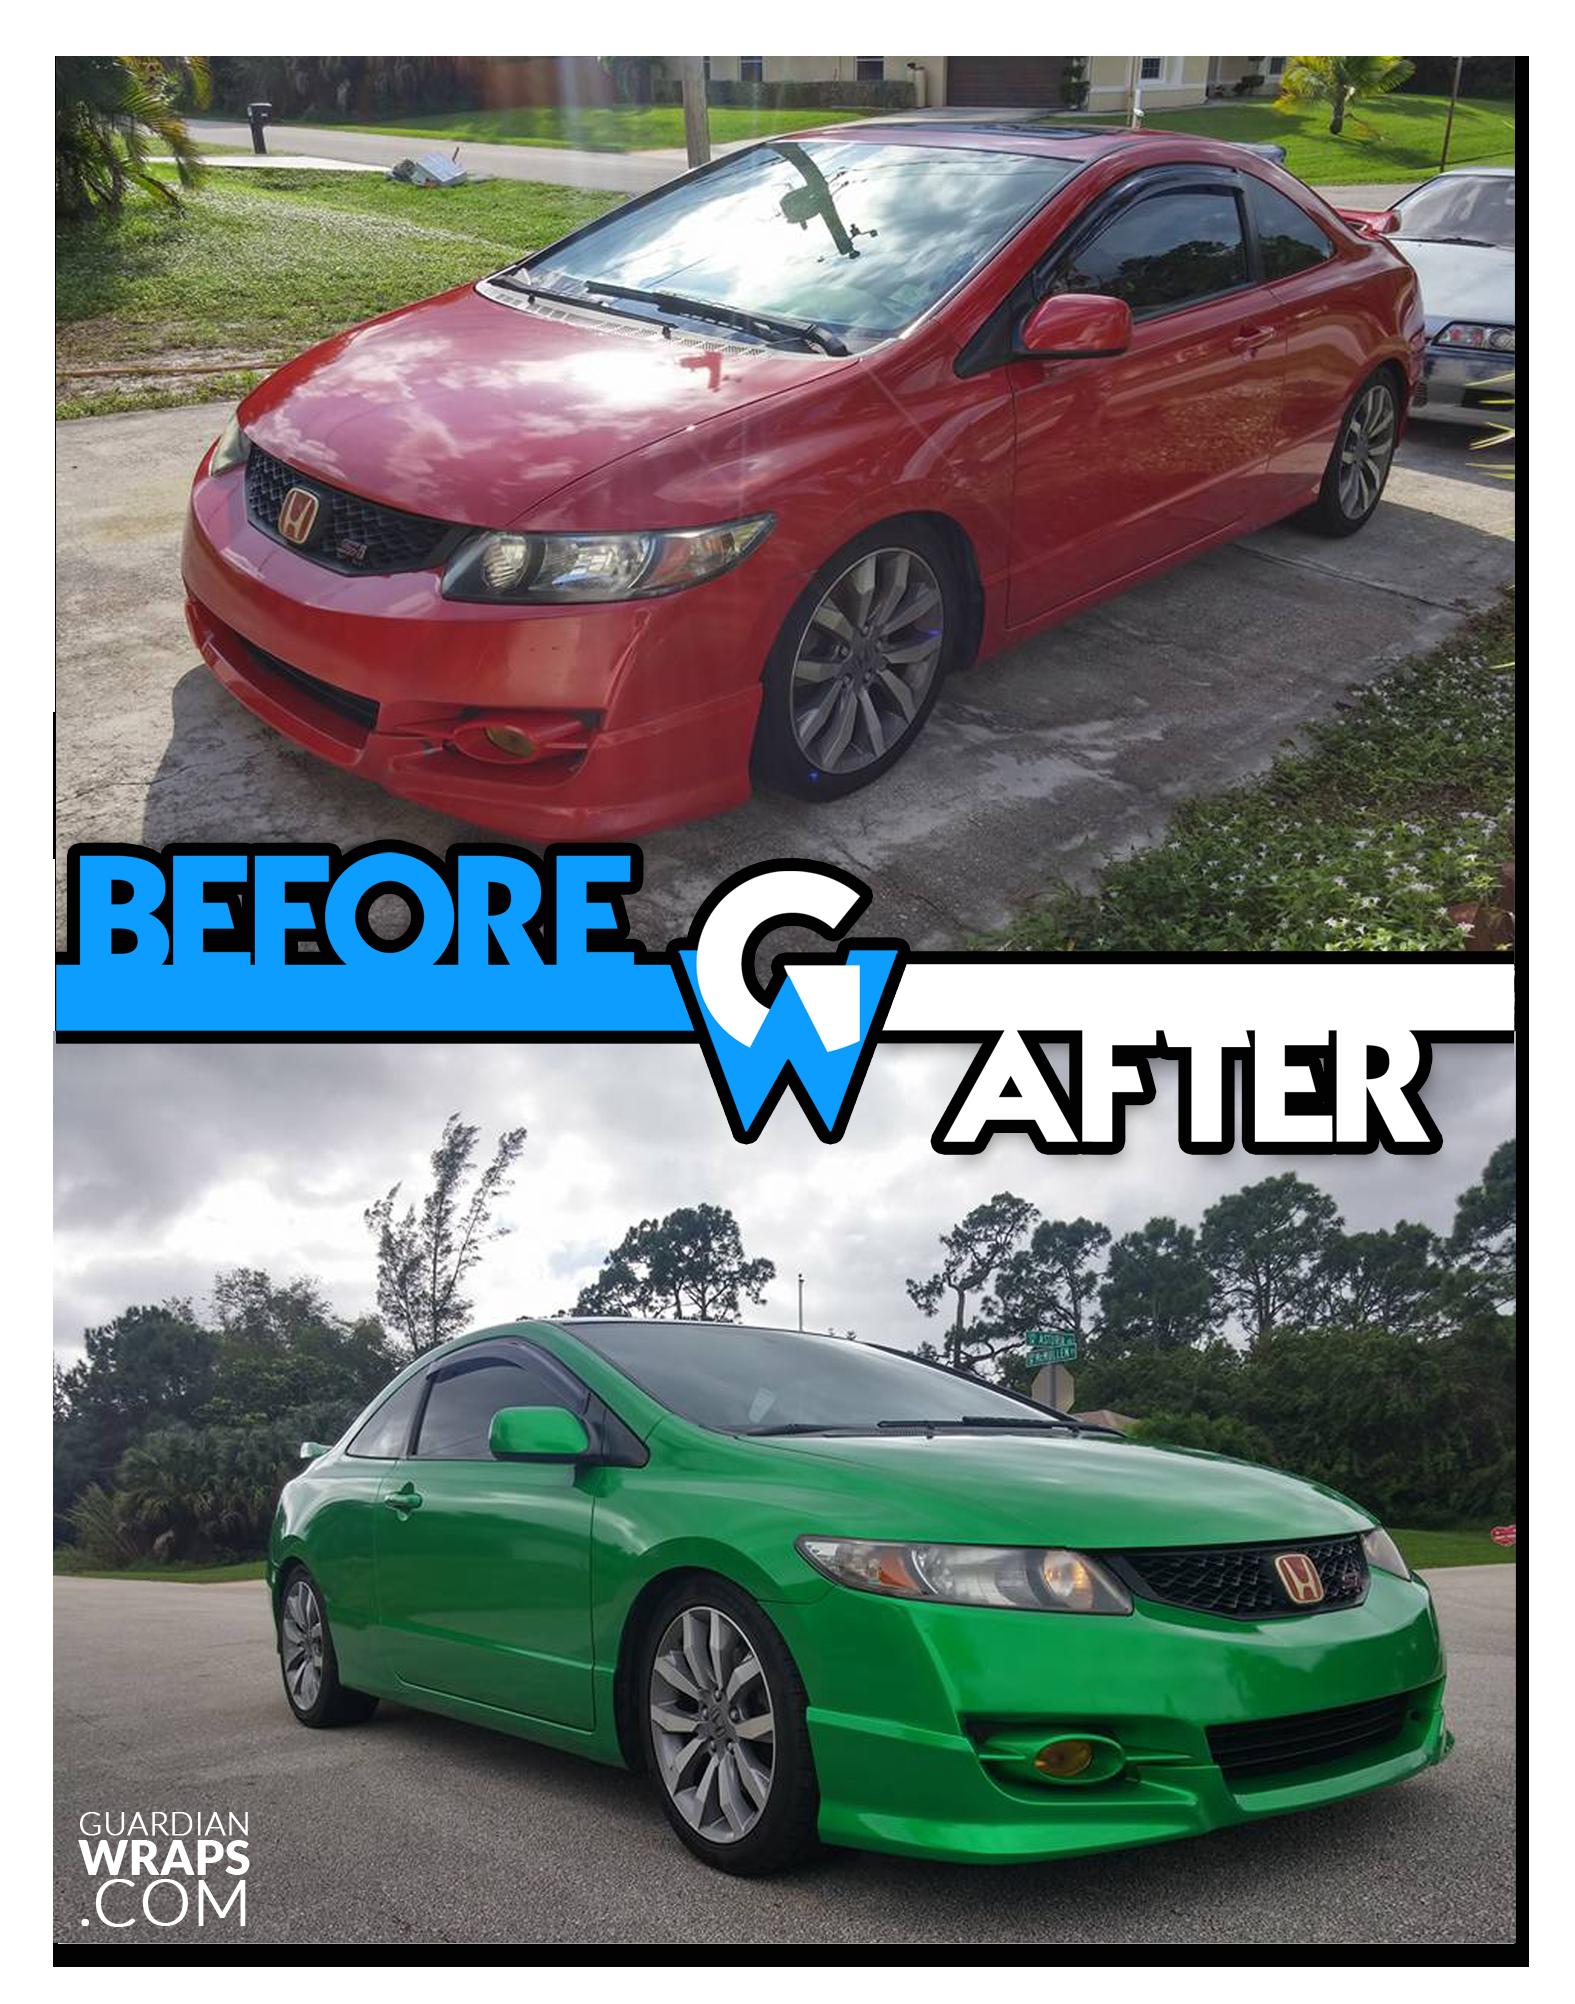 2010 Honda Civic Green Vinyl Wrap Guardian Wraps Before And After 2010 Honda Civic Vinyl Wrap Honda Civic